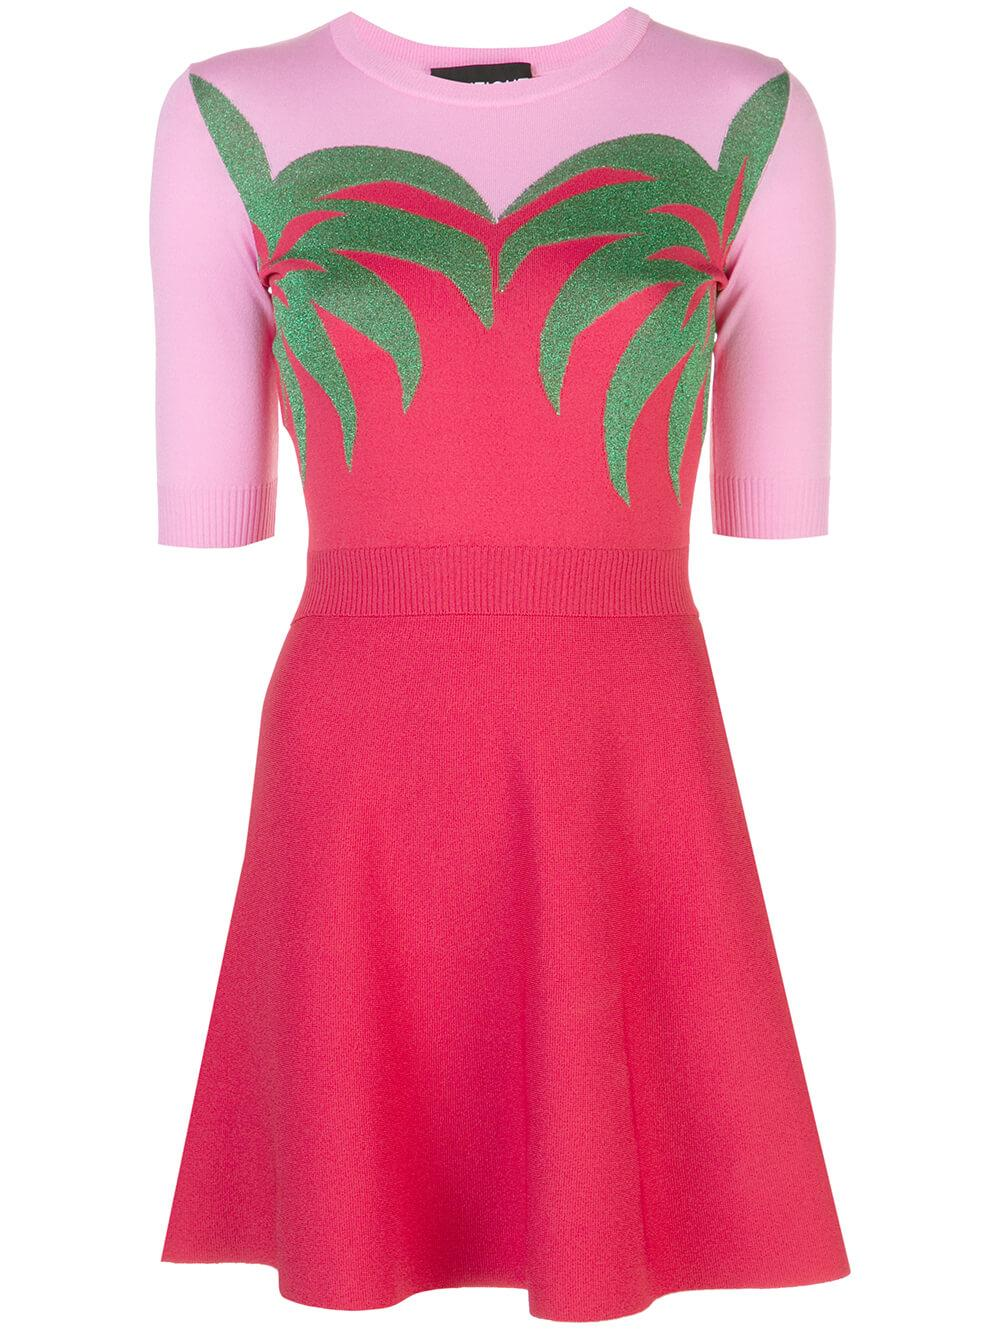 Palm Print Color Blocked Dress